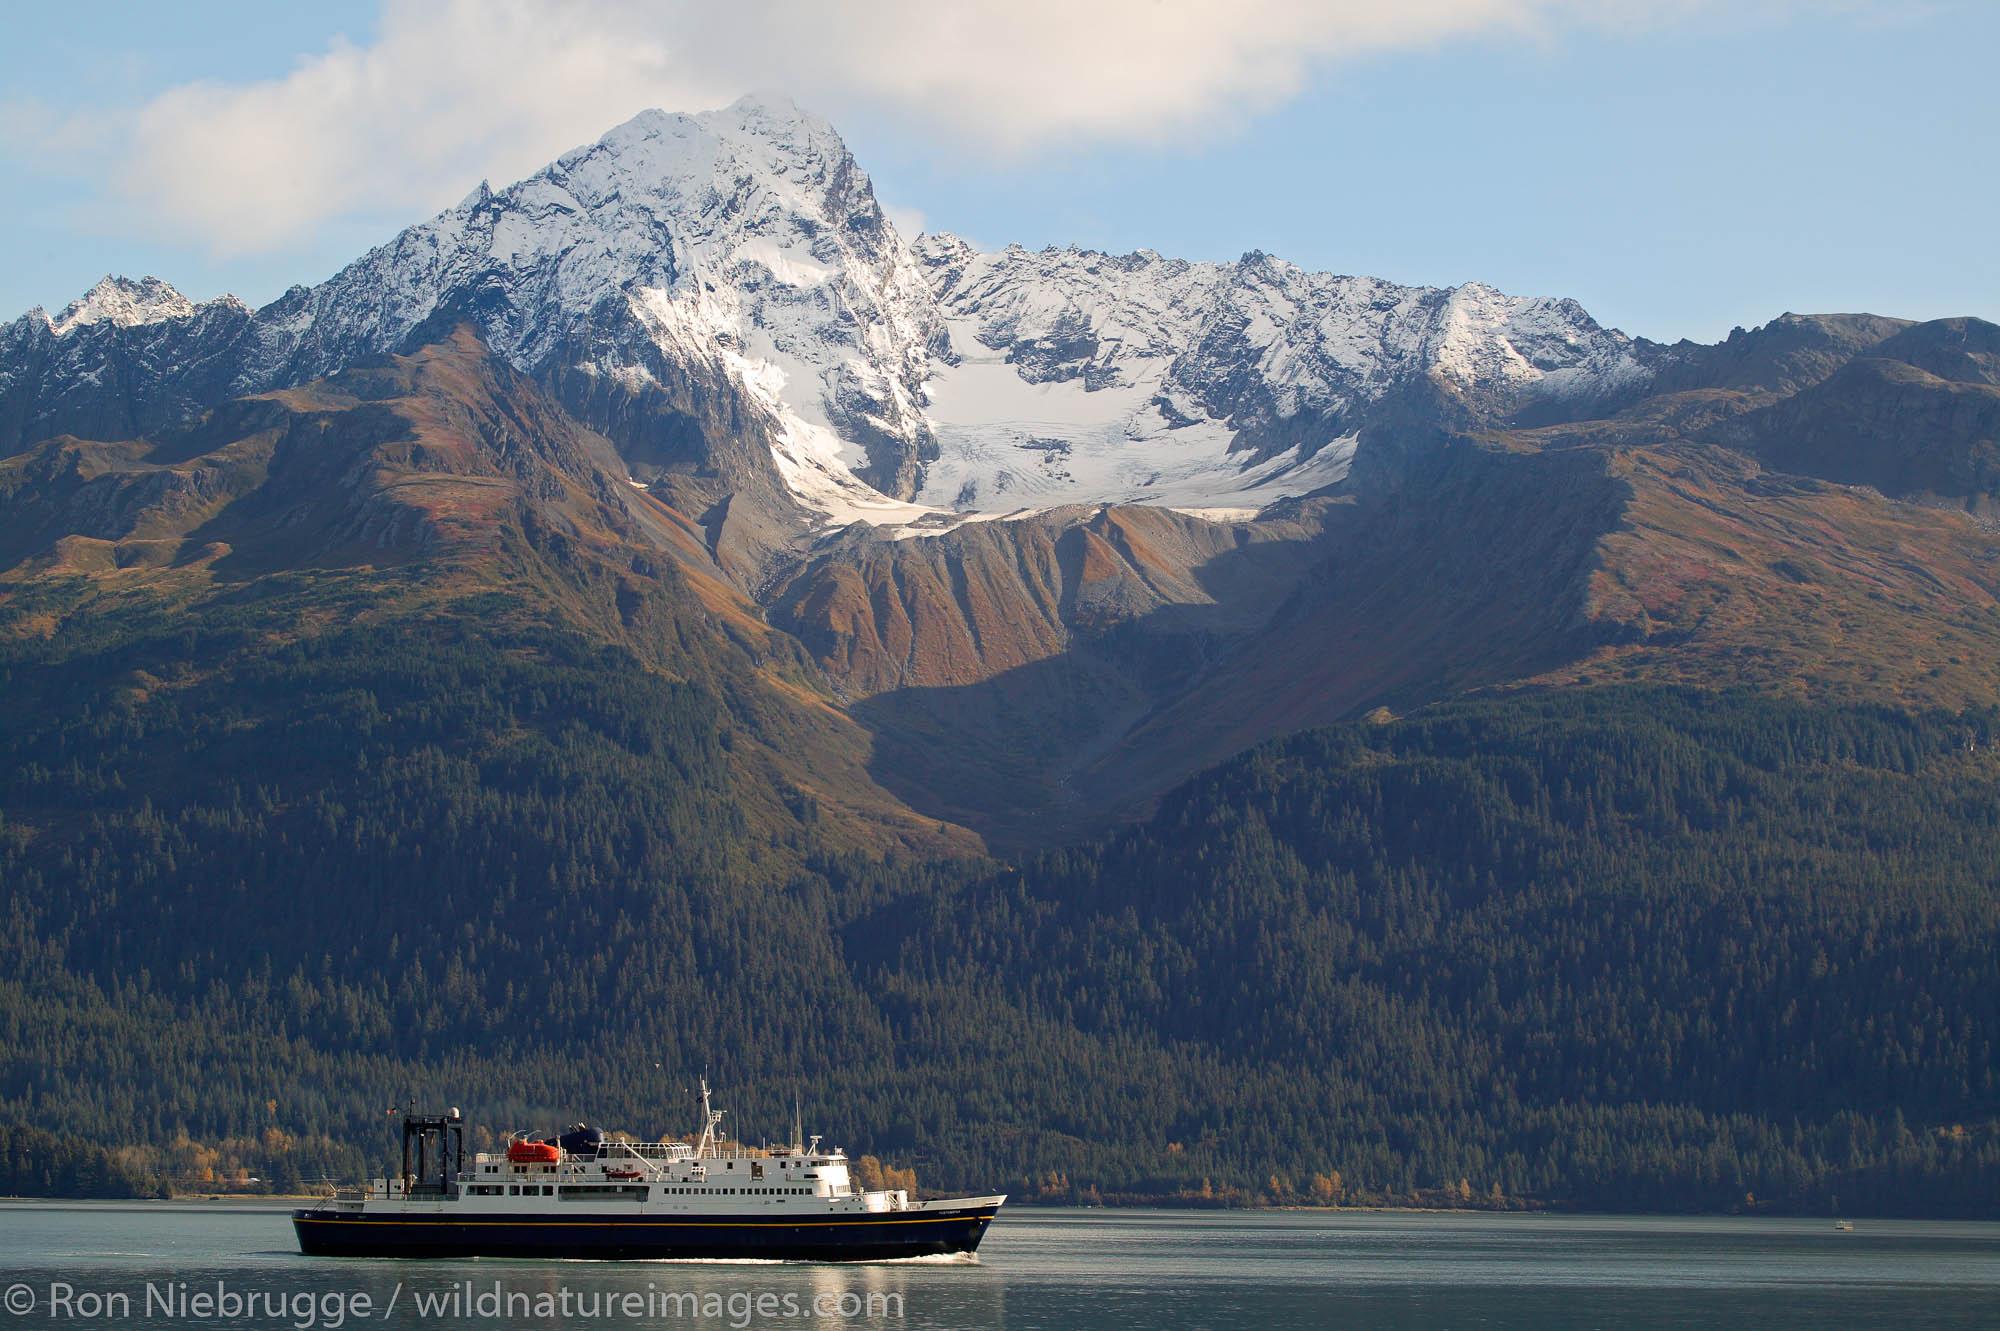 The Alaska State Ferry Tustumena leave Seward, Alaska for the final time.